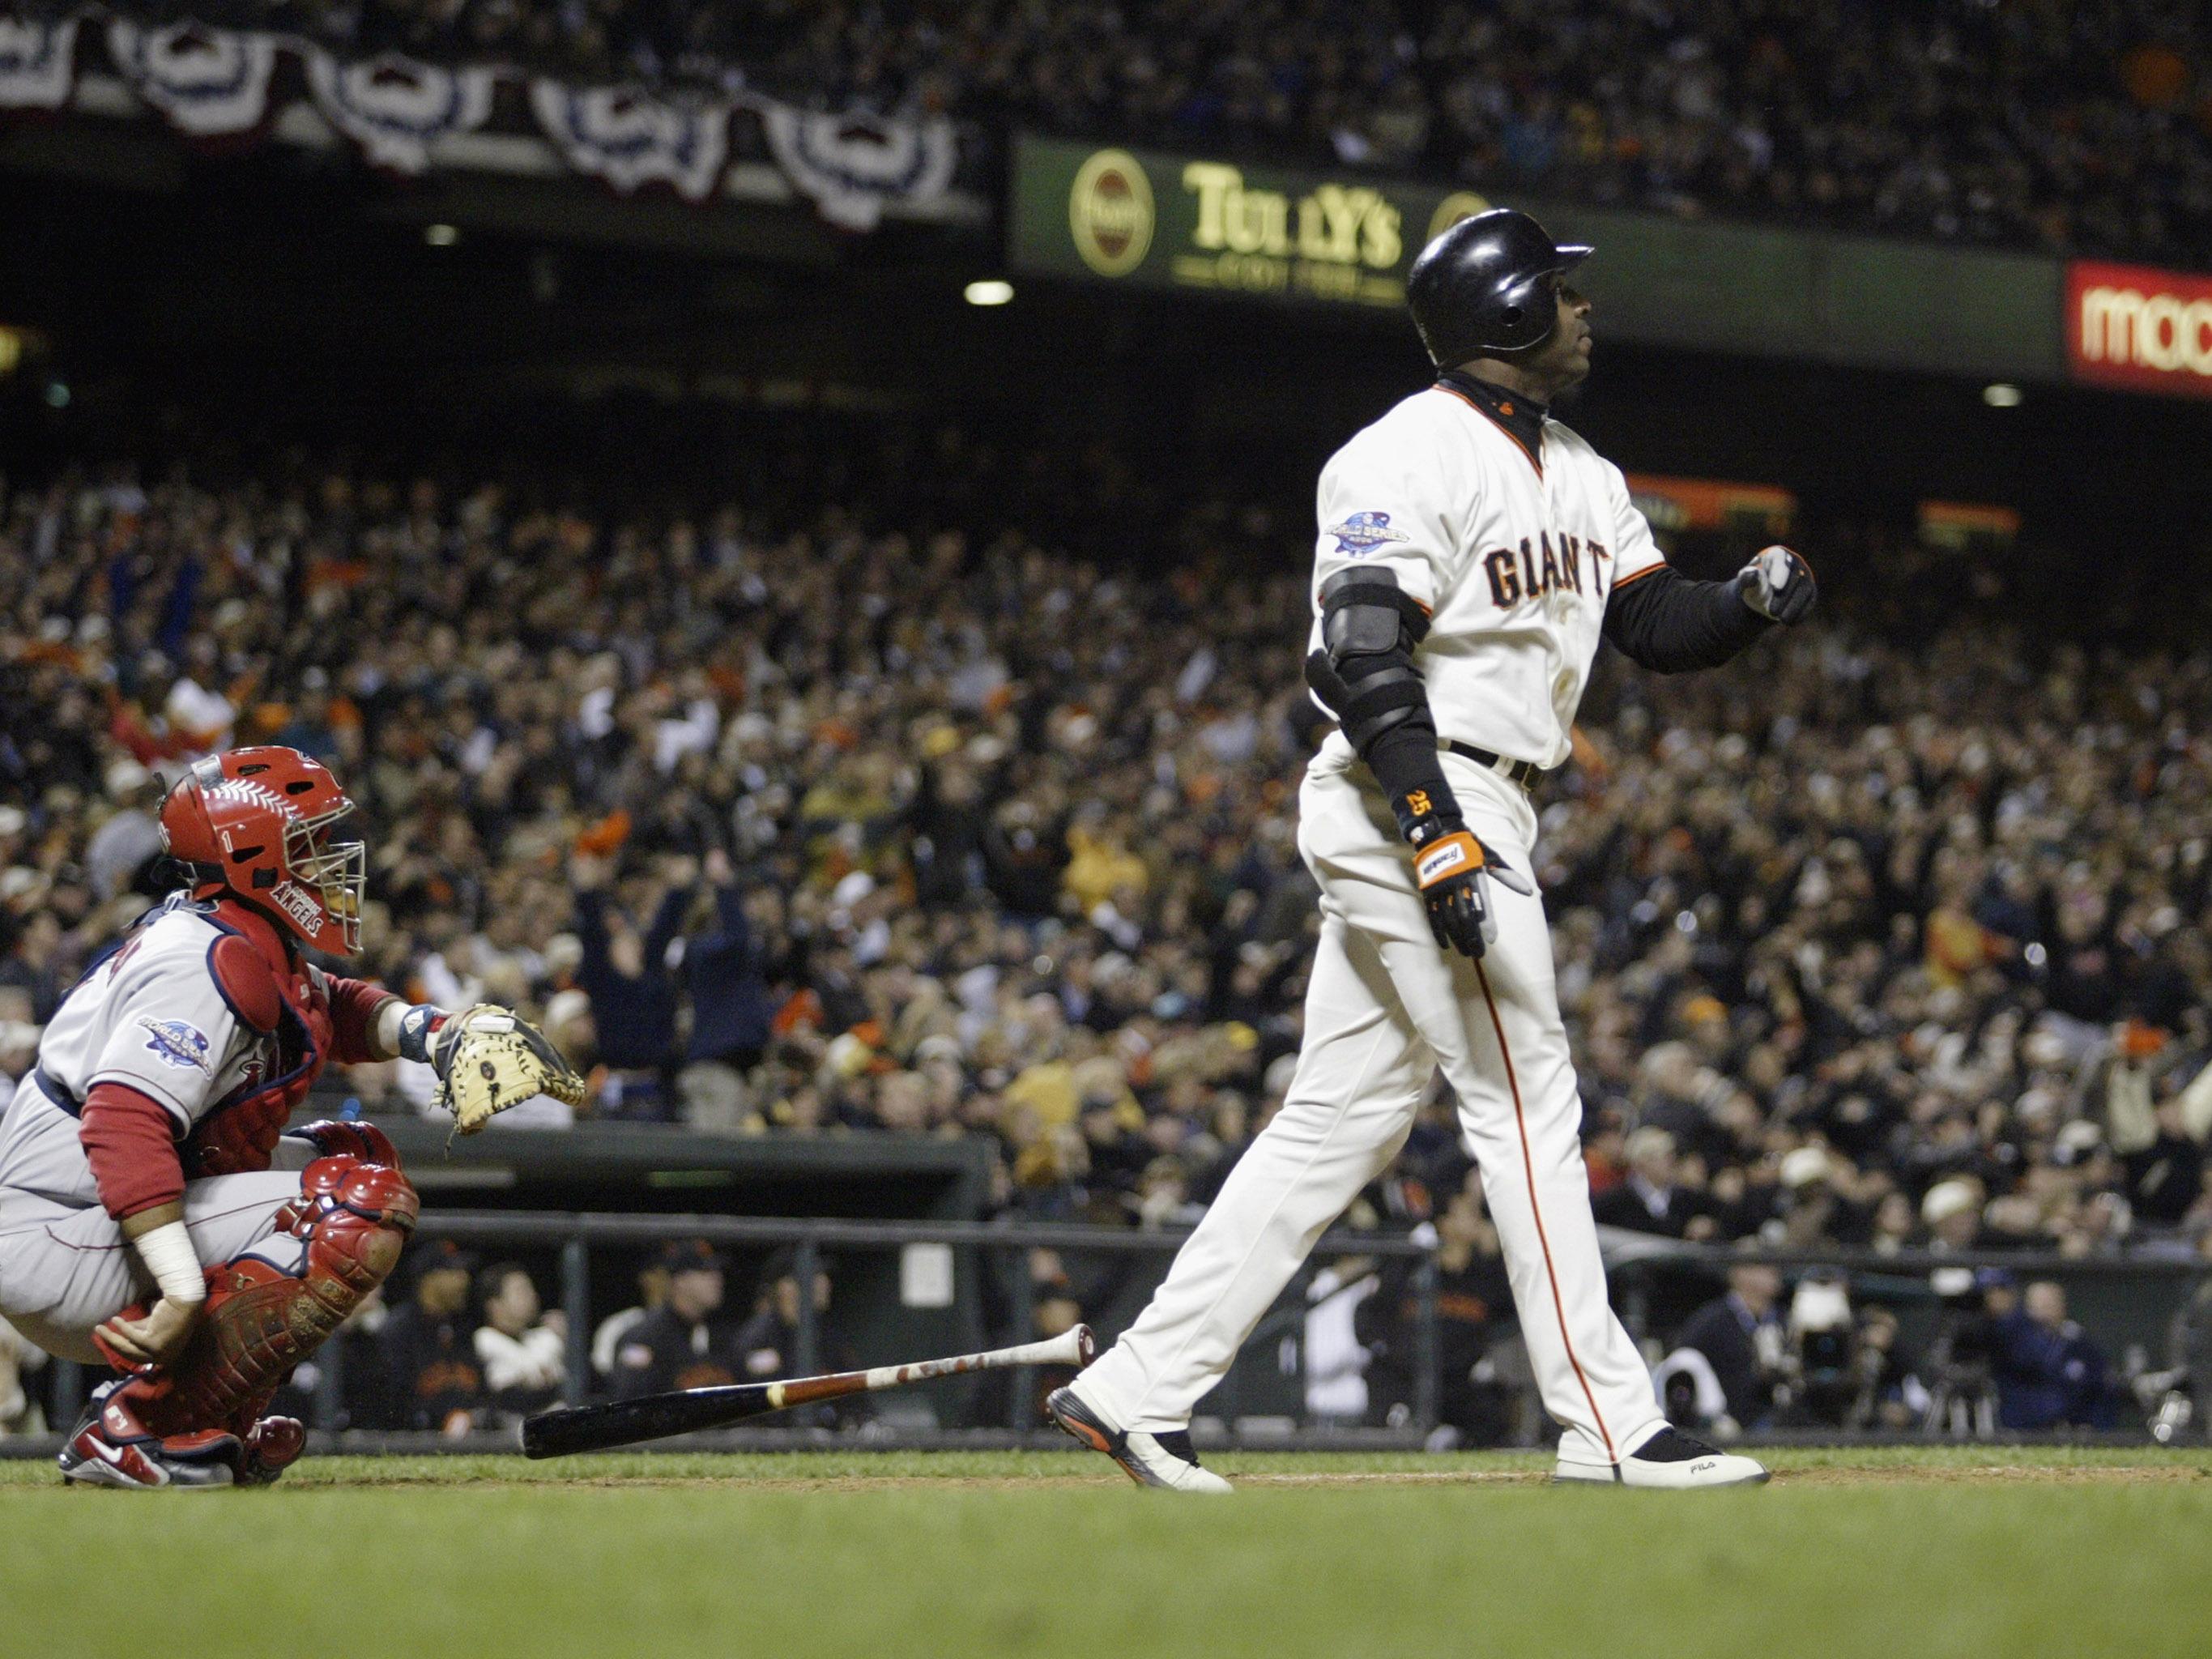 Barry Bonds hits a two run home run